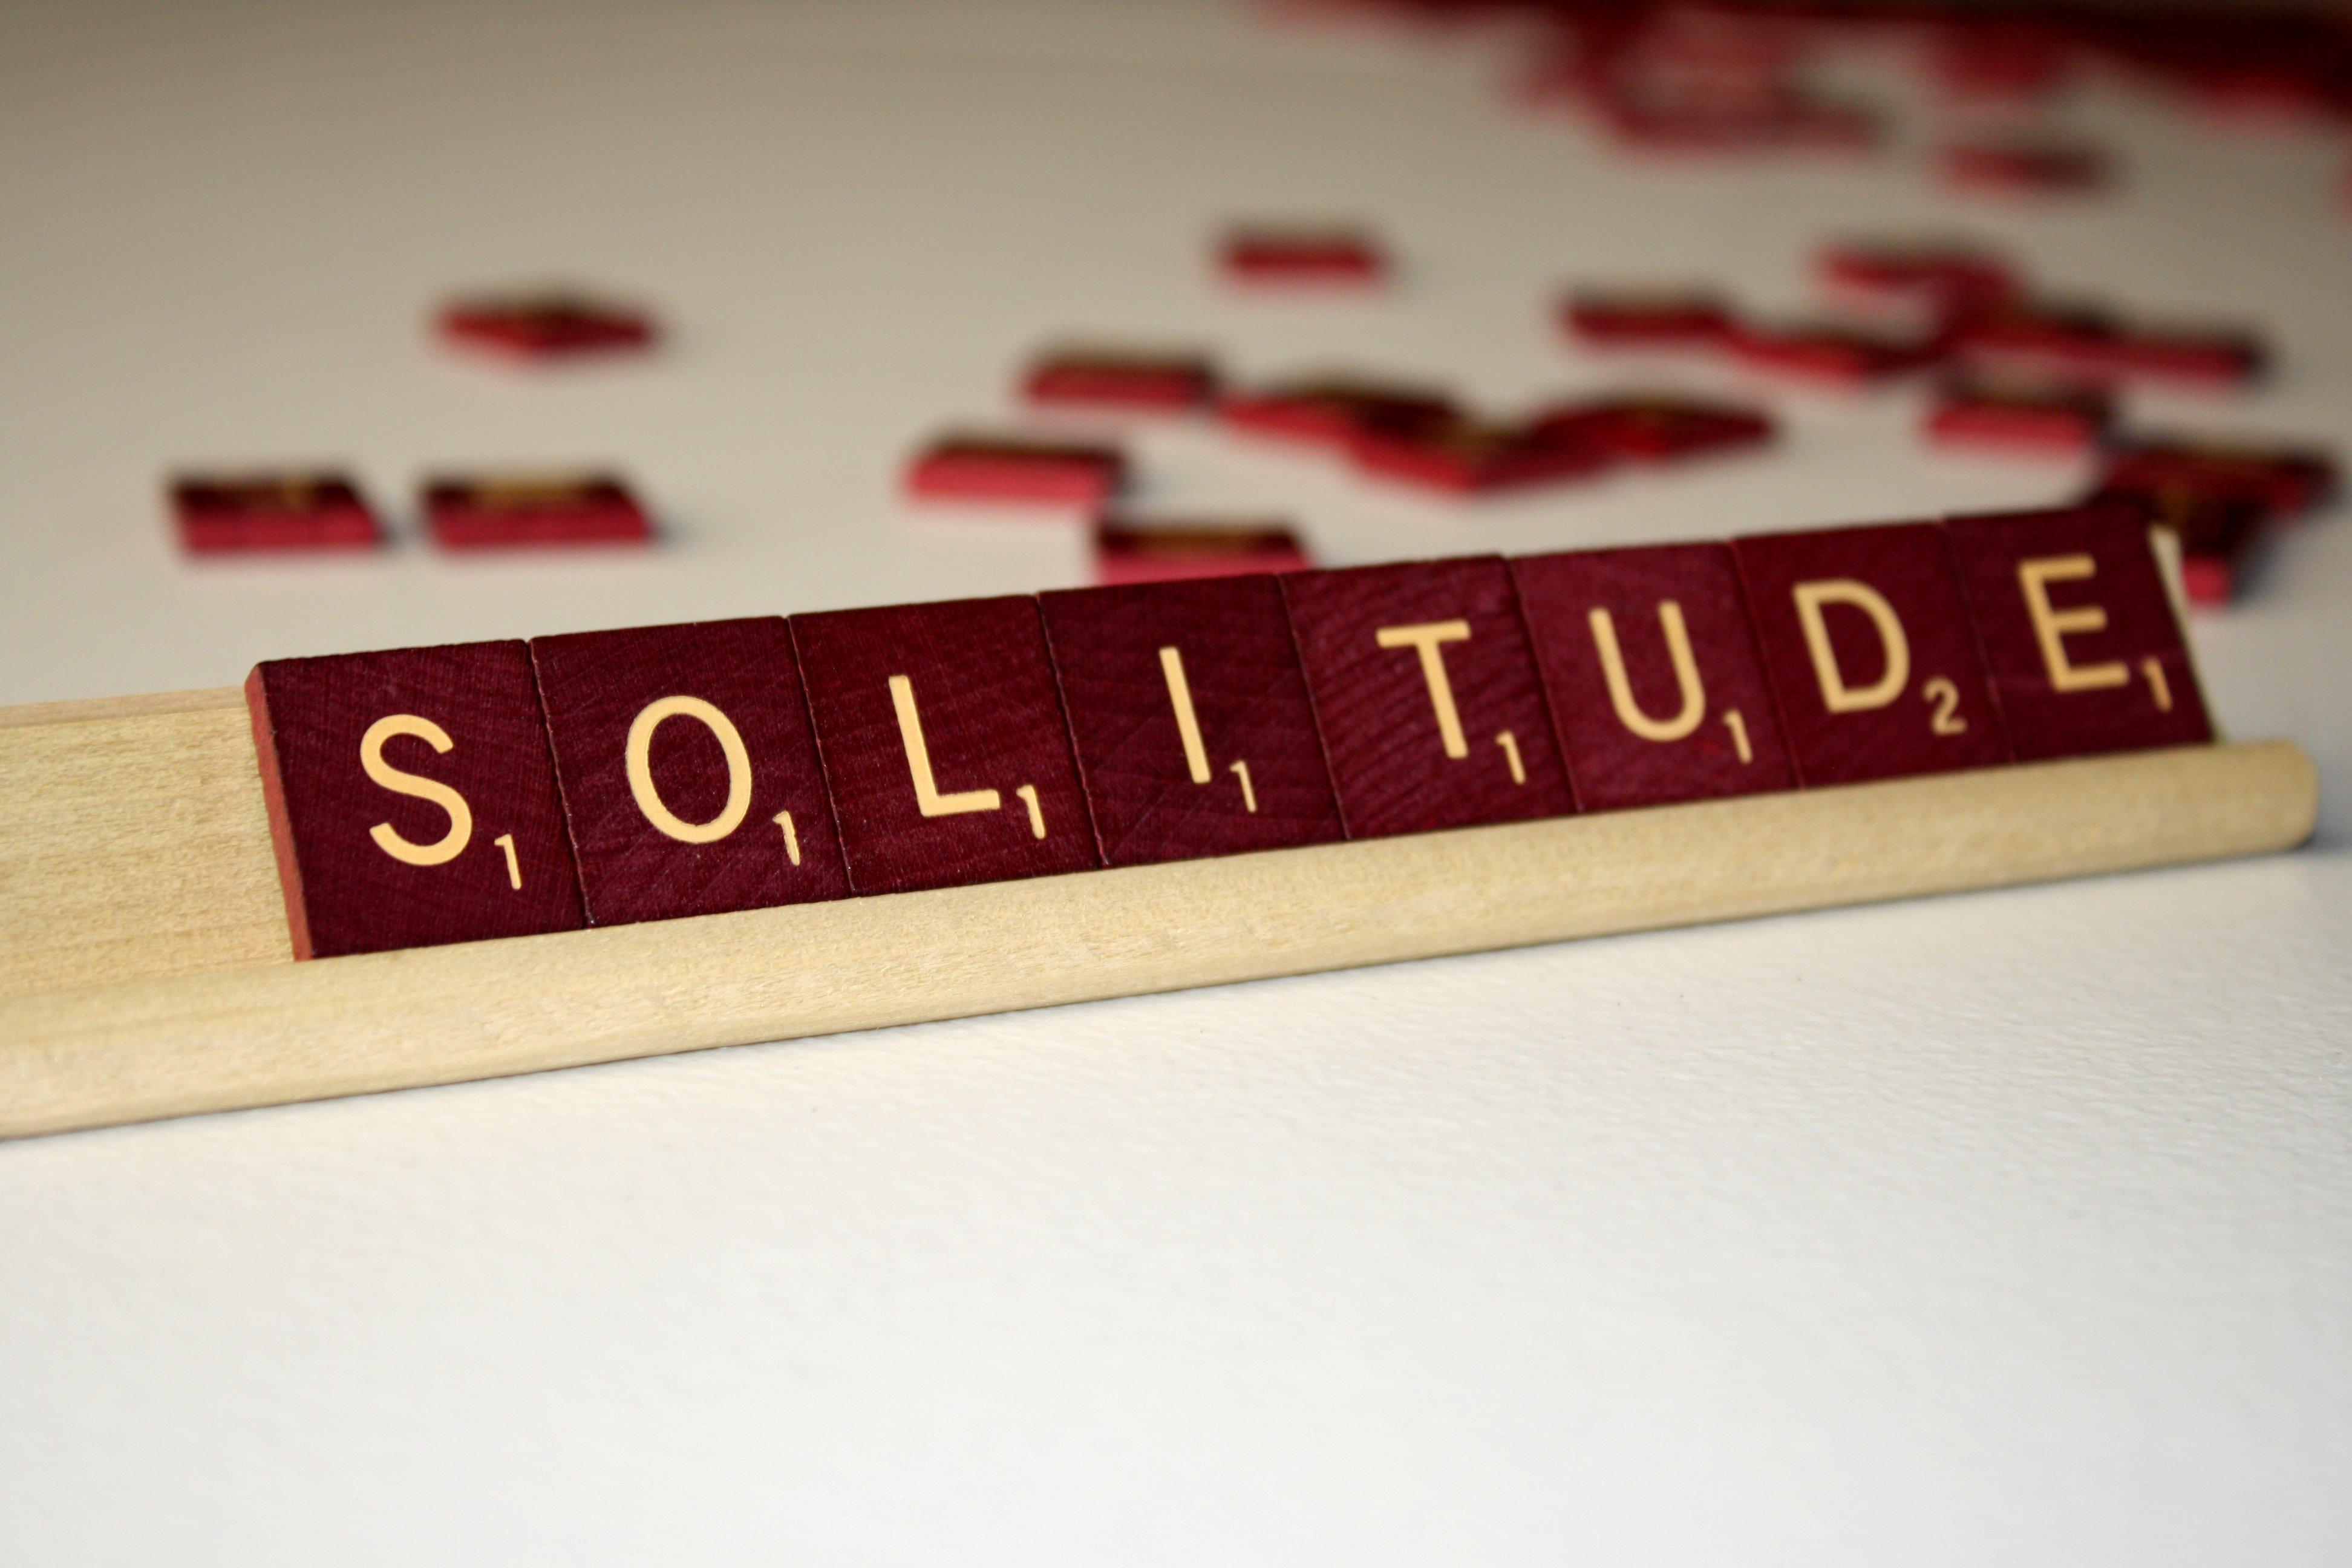 Essay on solitude